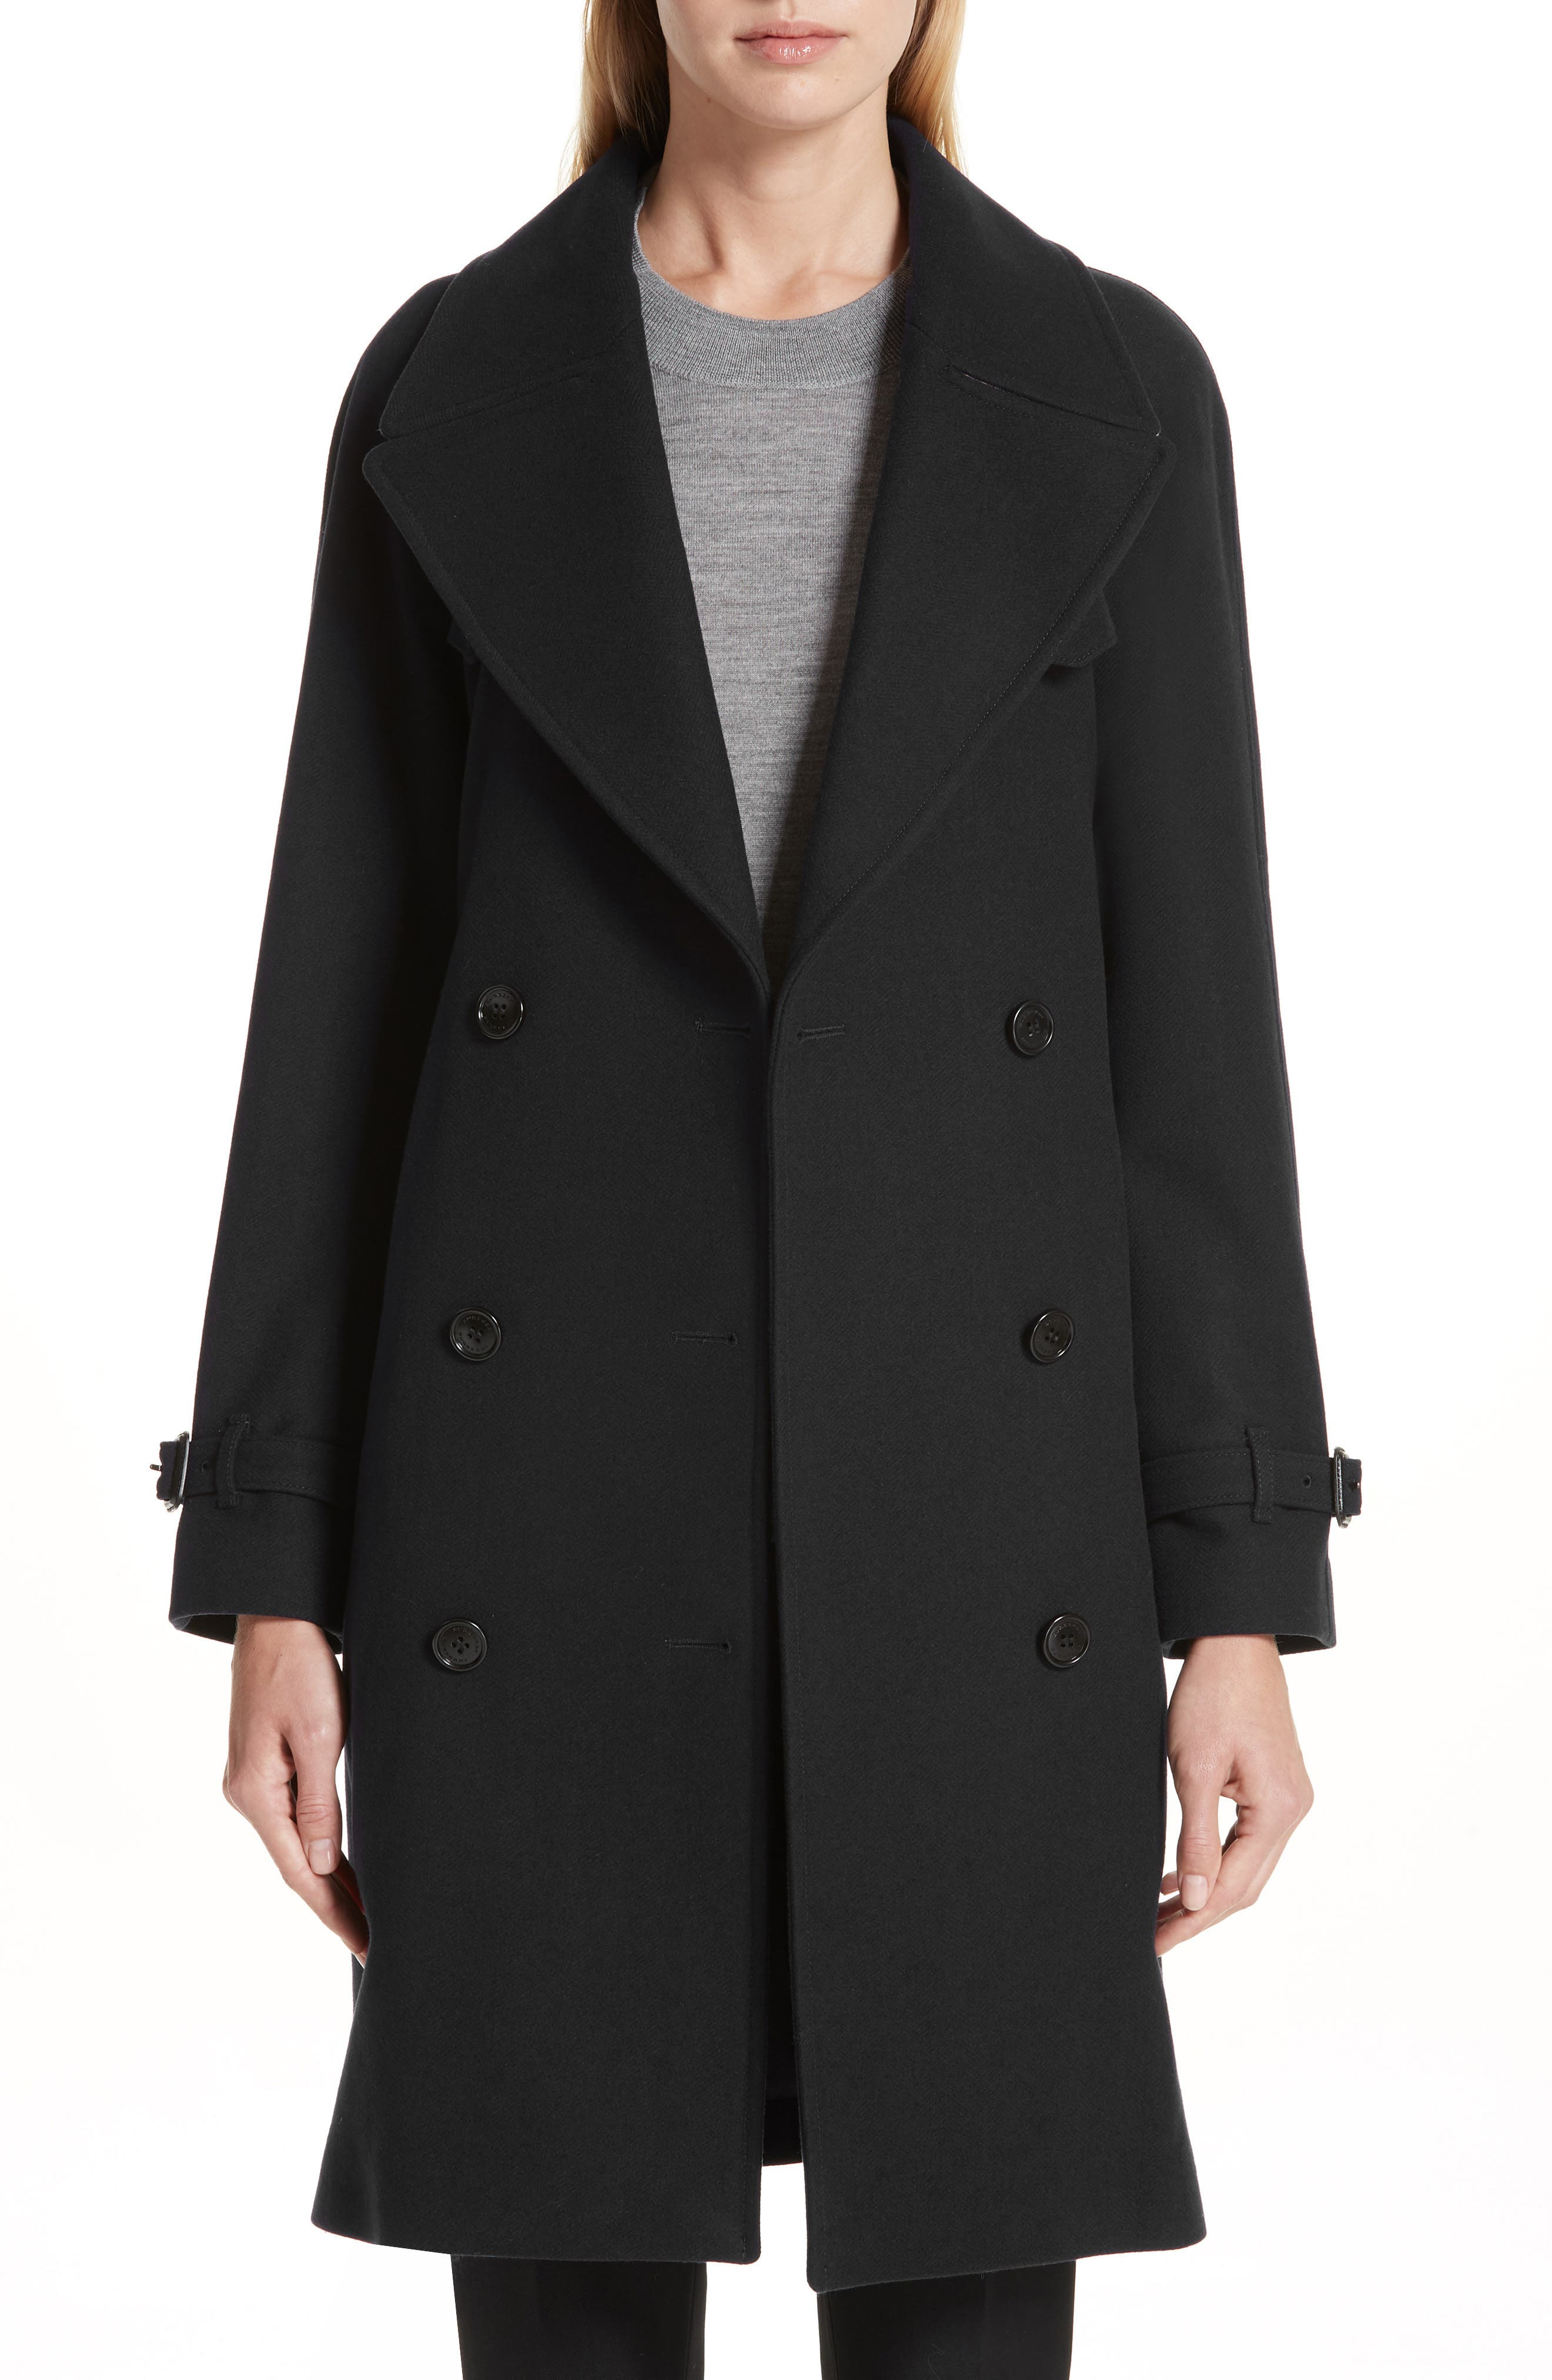 Cranston Wool Blend Trench Coat,                         Main,                         color, BLACK